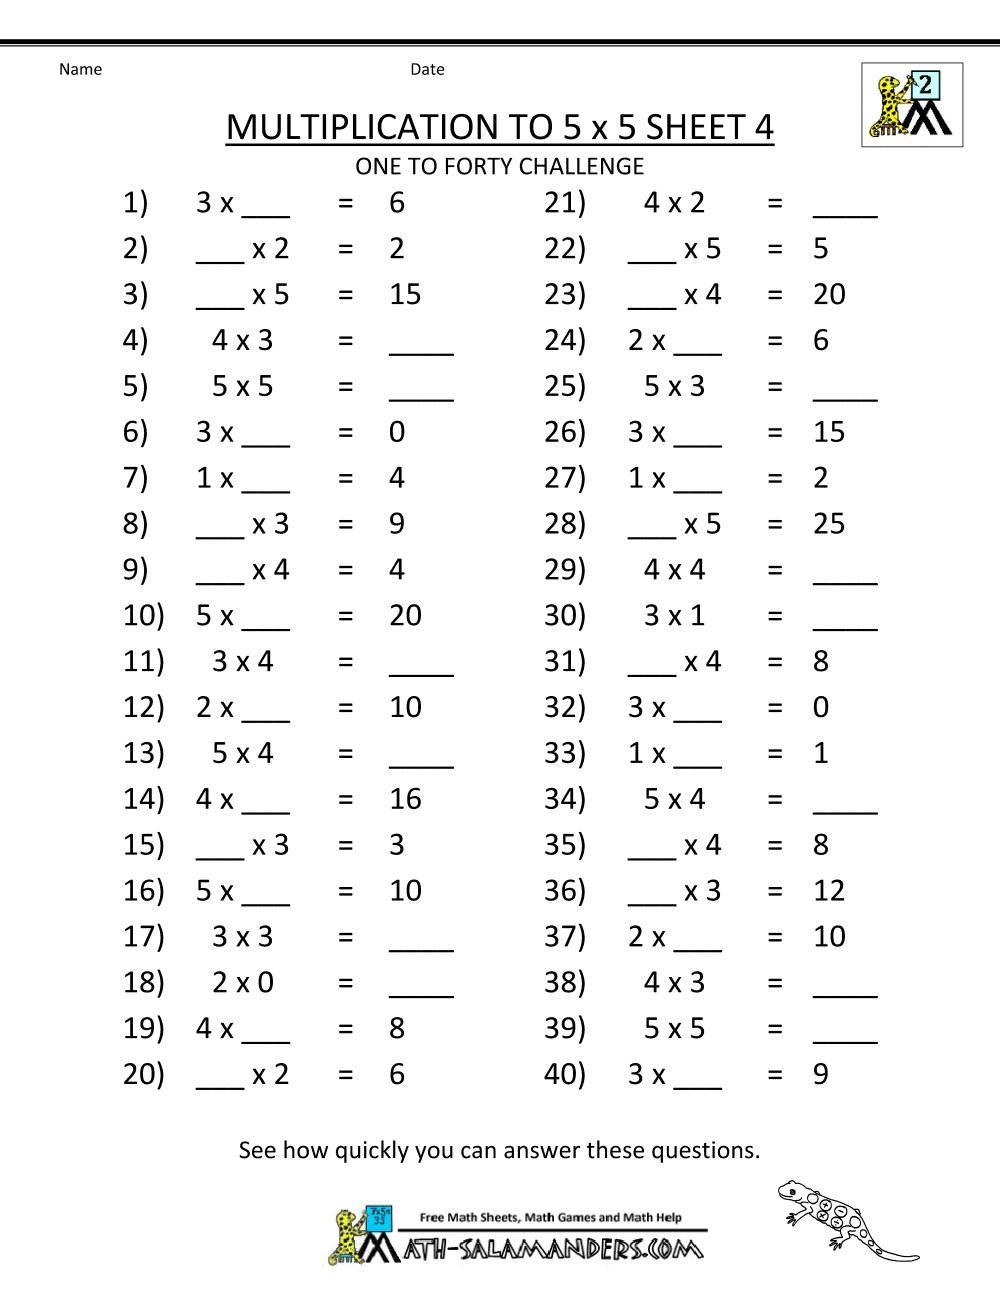 Multiplication Worksheets Grade 3 Coloring | 3Rd Grade Math inside Printable Multiplication Worksheets Grade 3